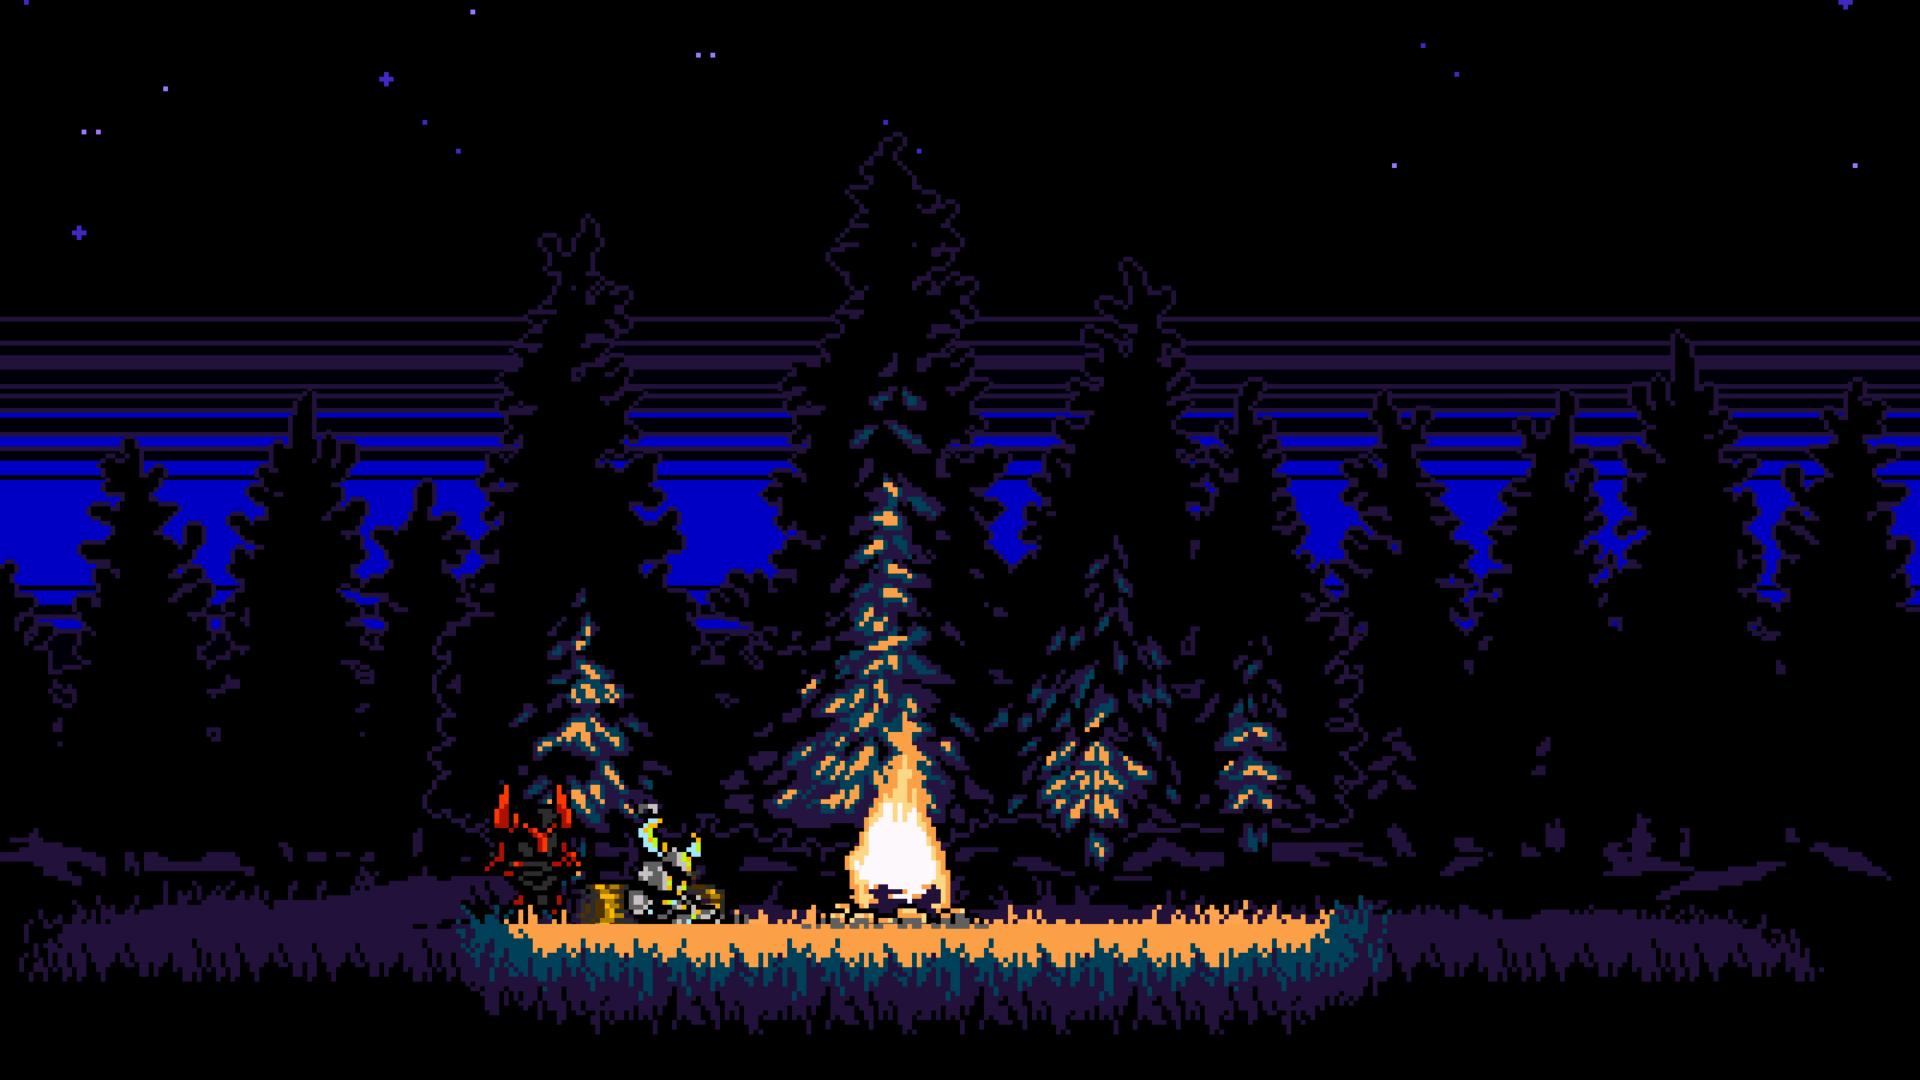 Wallpaper Video Games Night Pixel Art Retro Games 16